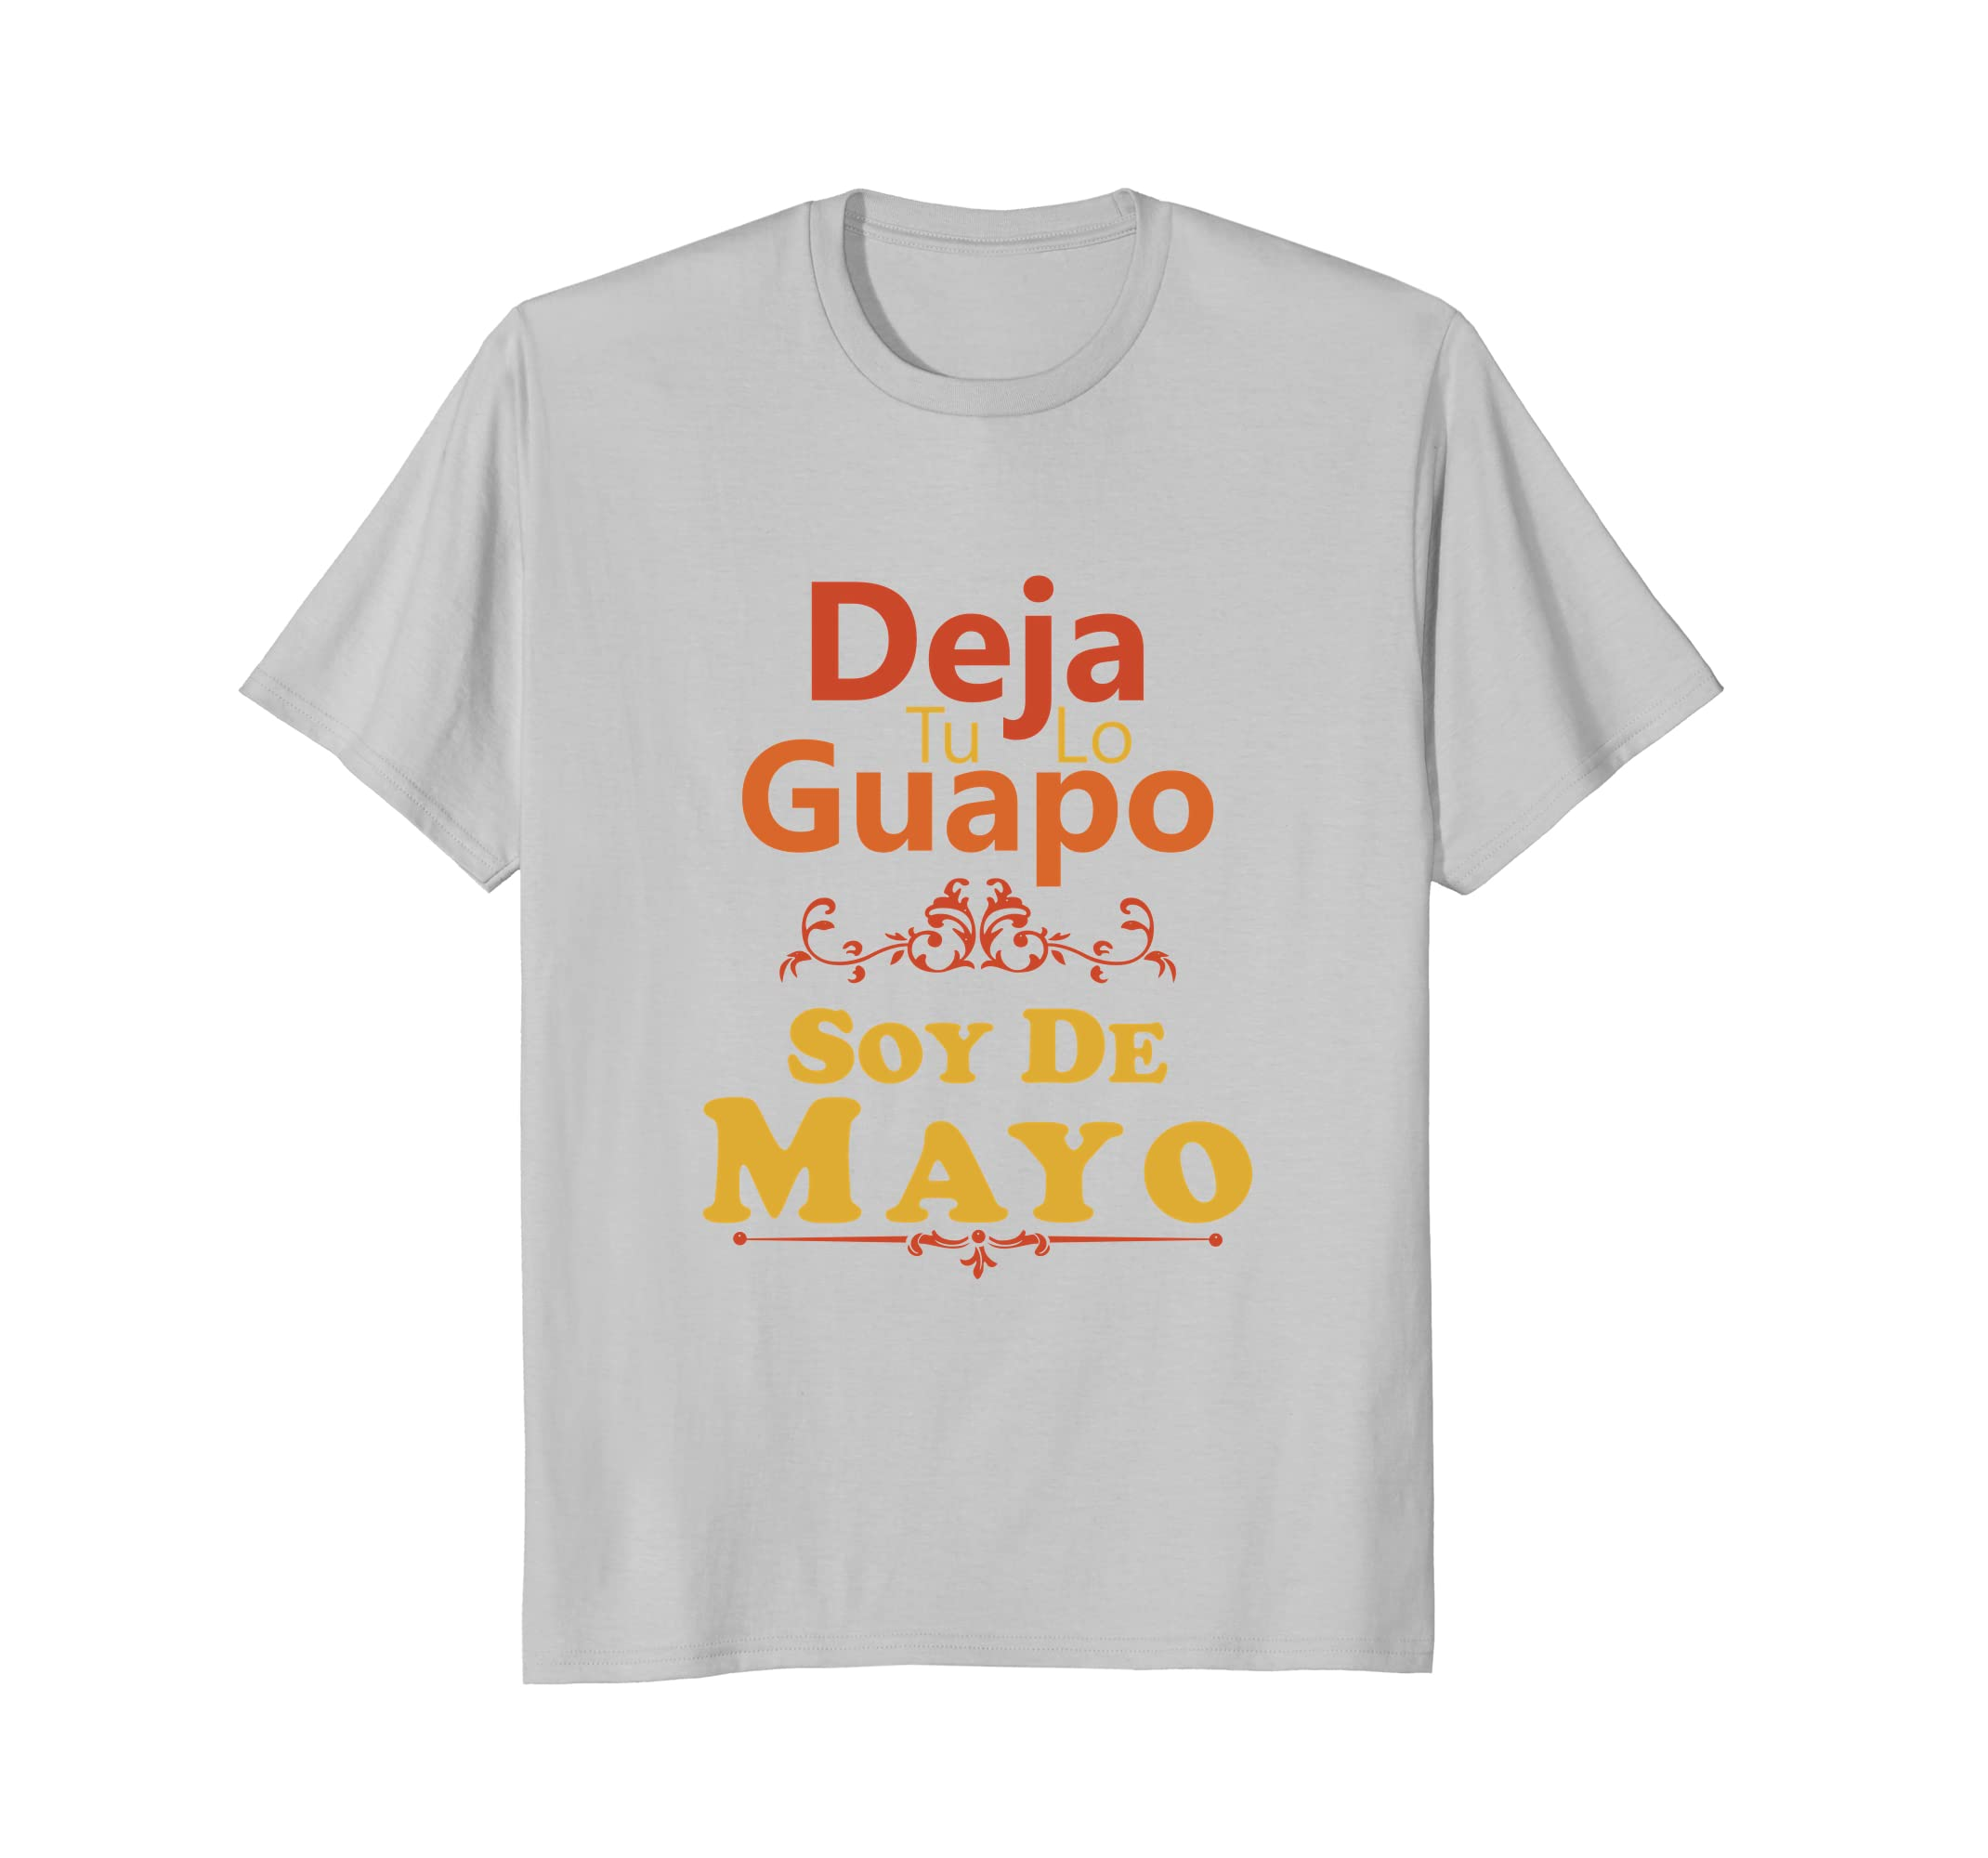 Amazon.com: Camiseta De Hombre Deja Tu Lo Guapo Soy De Mayo Spanish Tee: Clothing